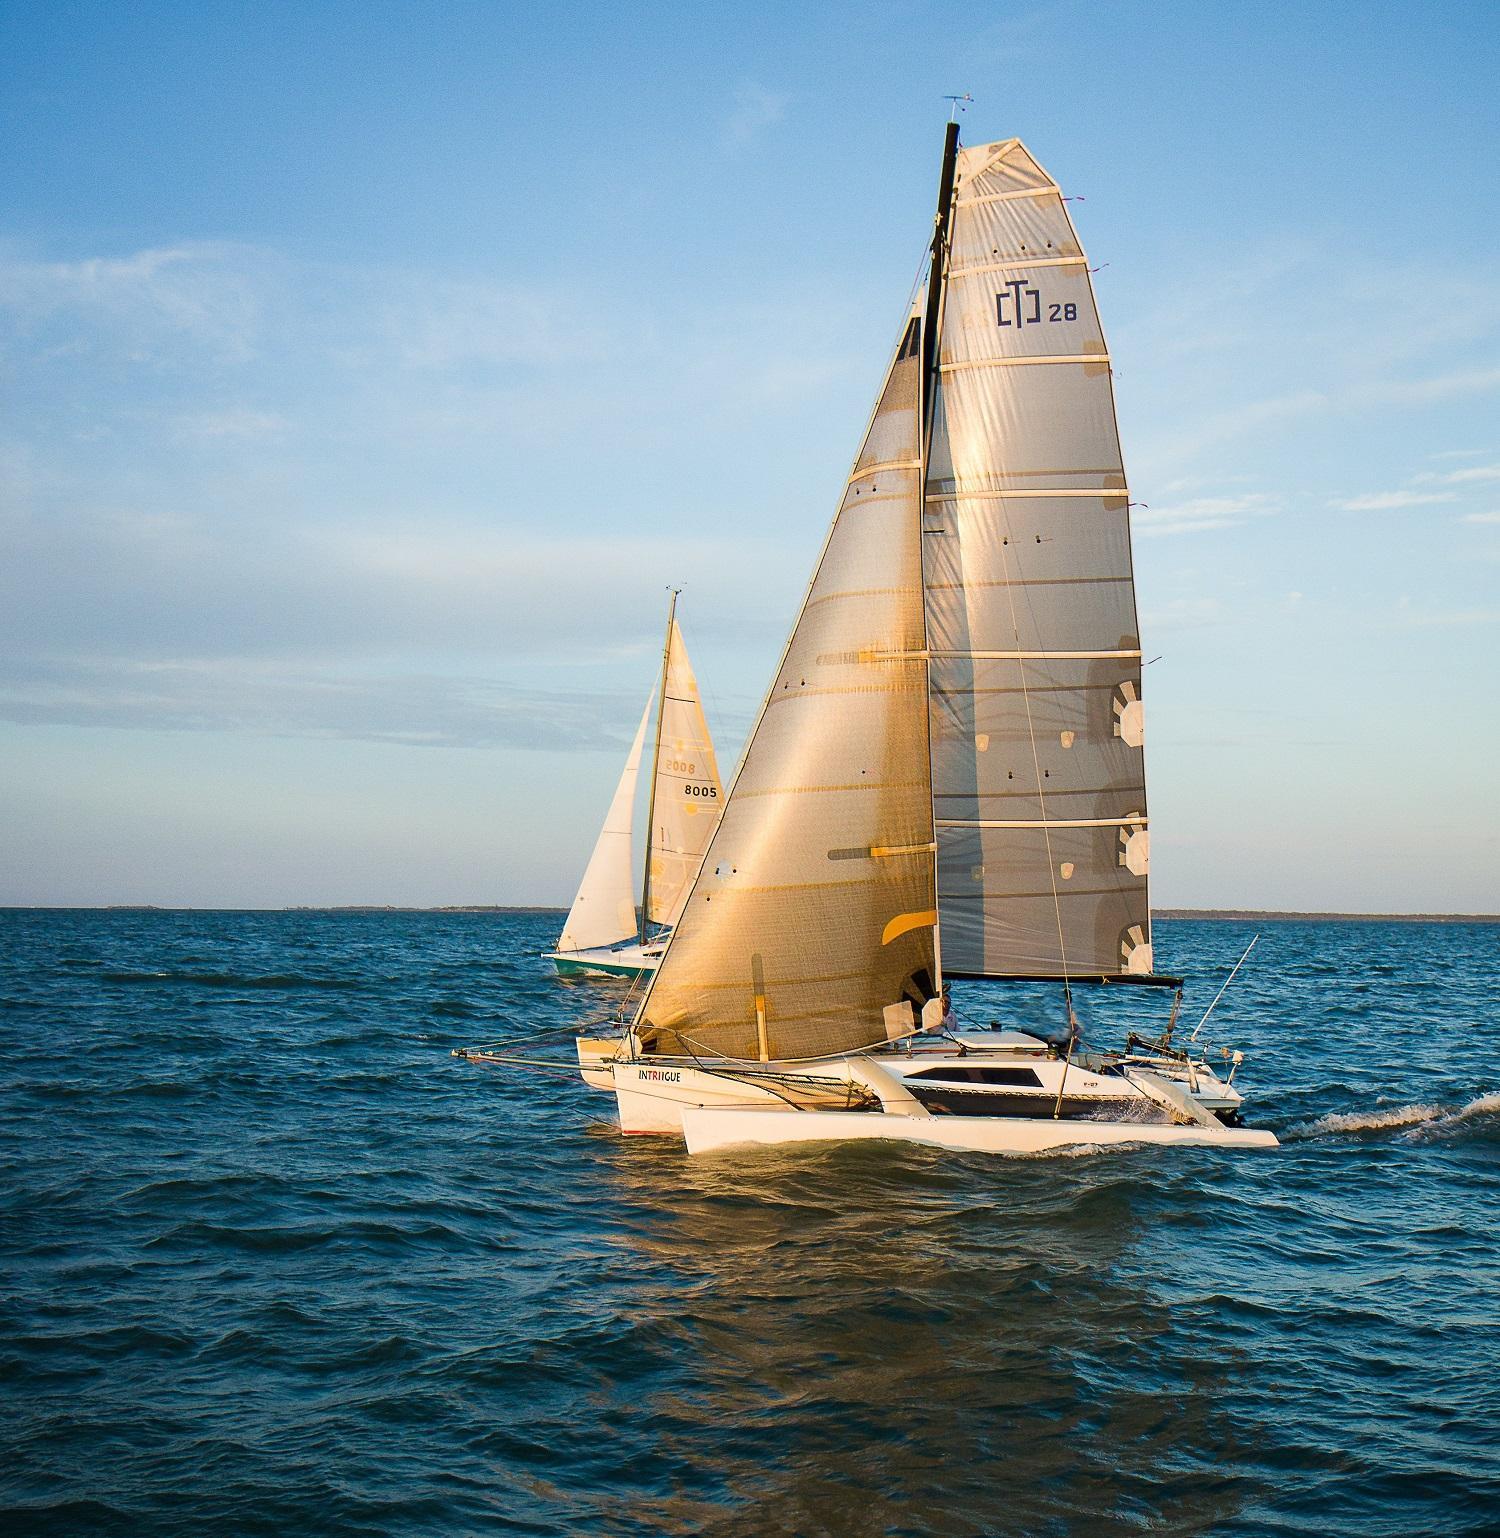 Corsair f27 under sails